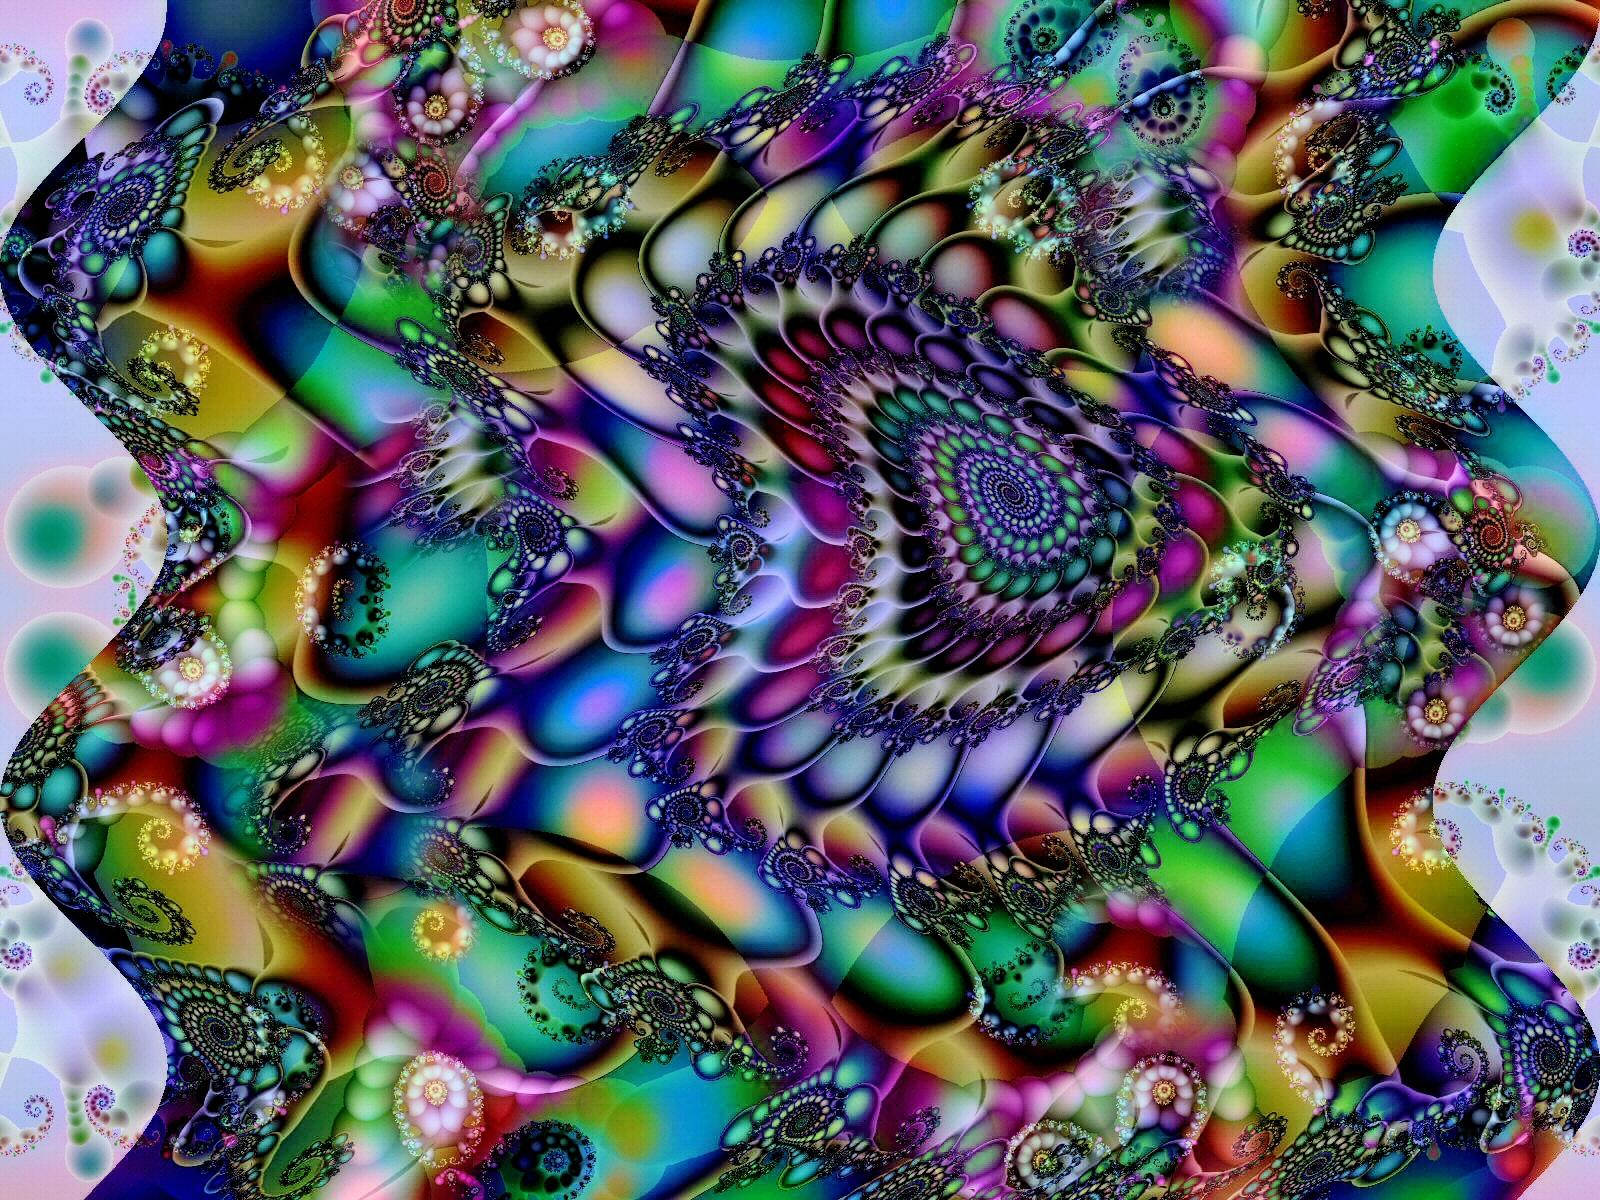 Psychedelic Computer Wallpapers Desktop Backgrounds 1600x1200 ID 1600x1200